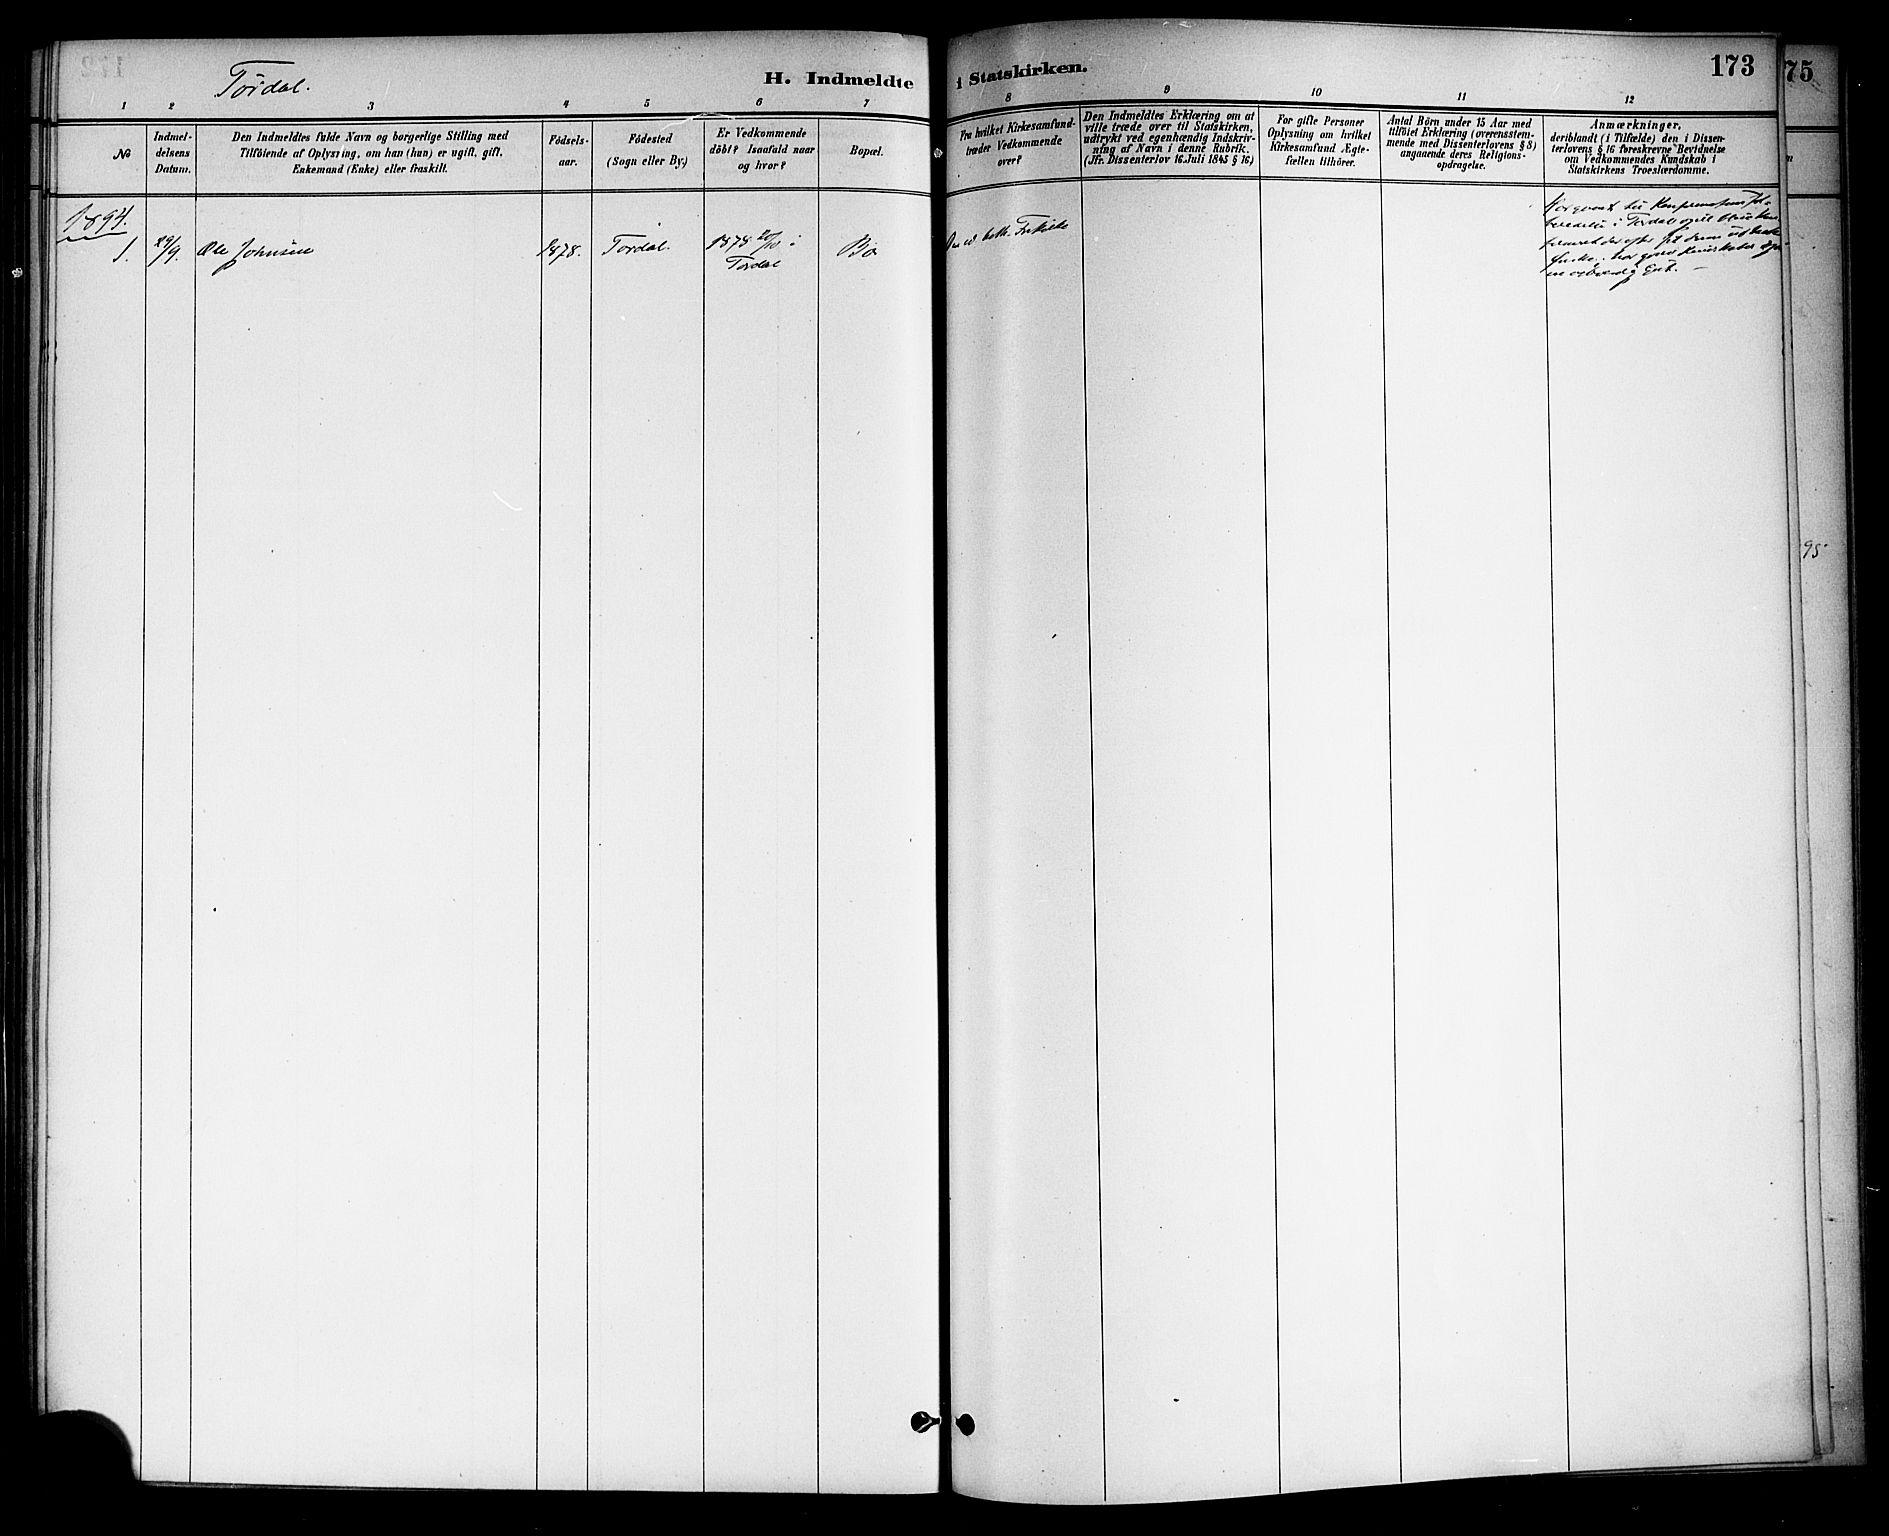 SAKO, Drangedal kirkebøker, F/Fa/L0011: Ministerialbok nr. 11 /2, 1885-1894, s. 173